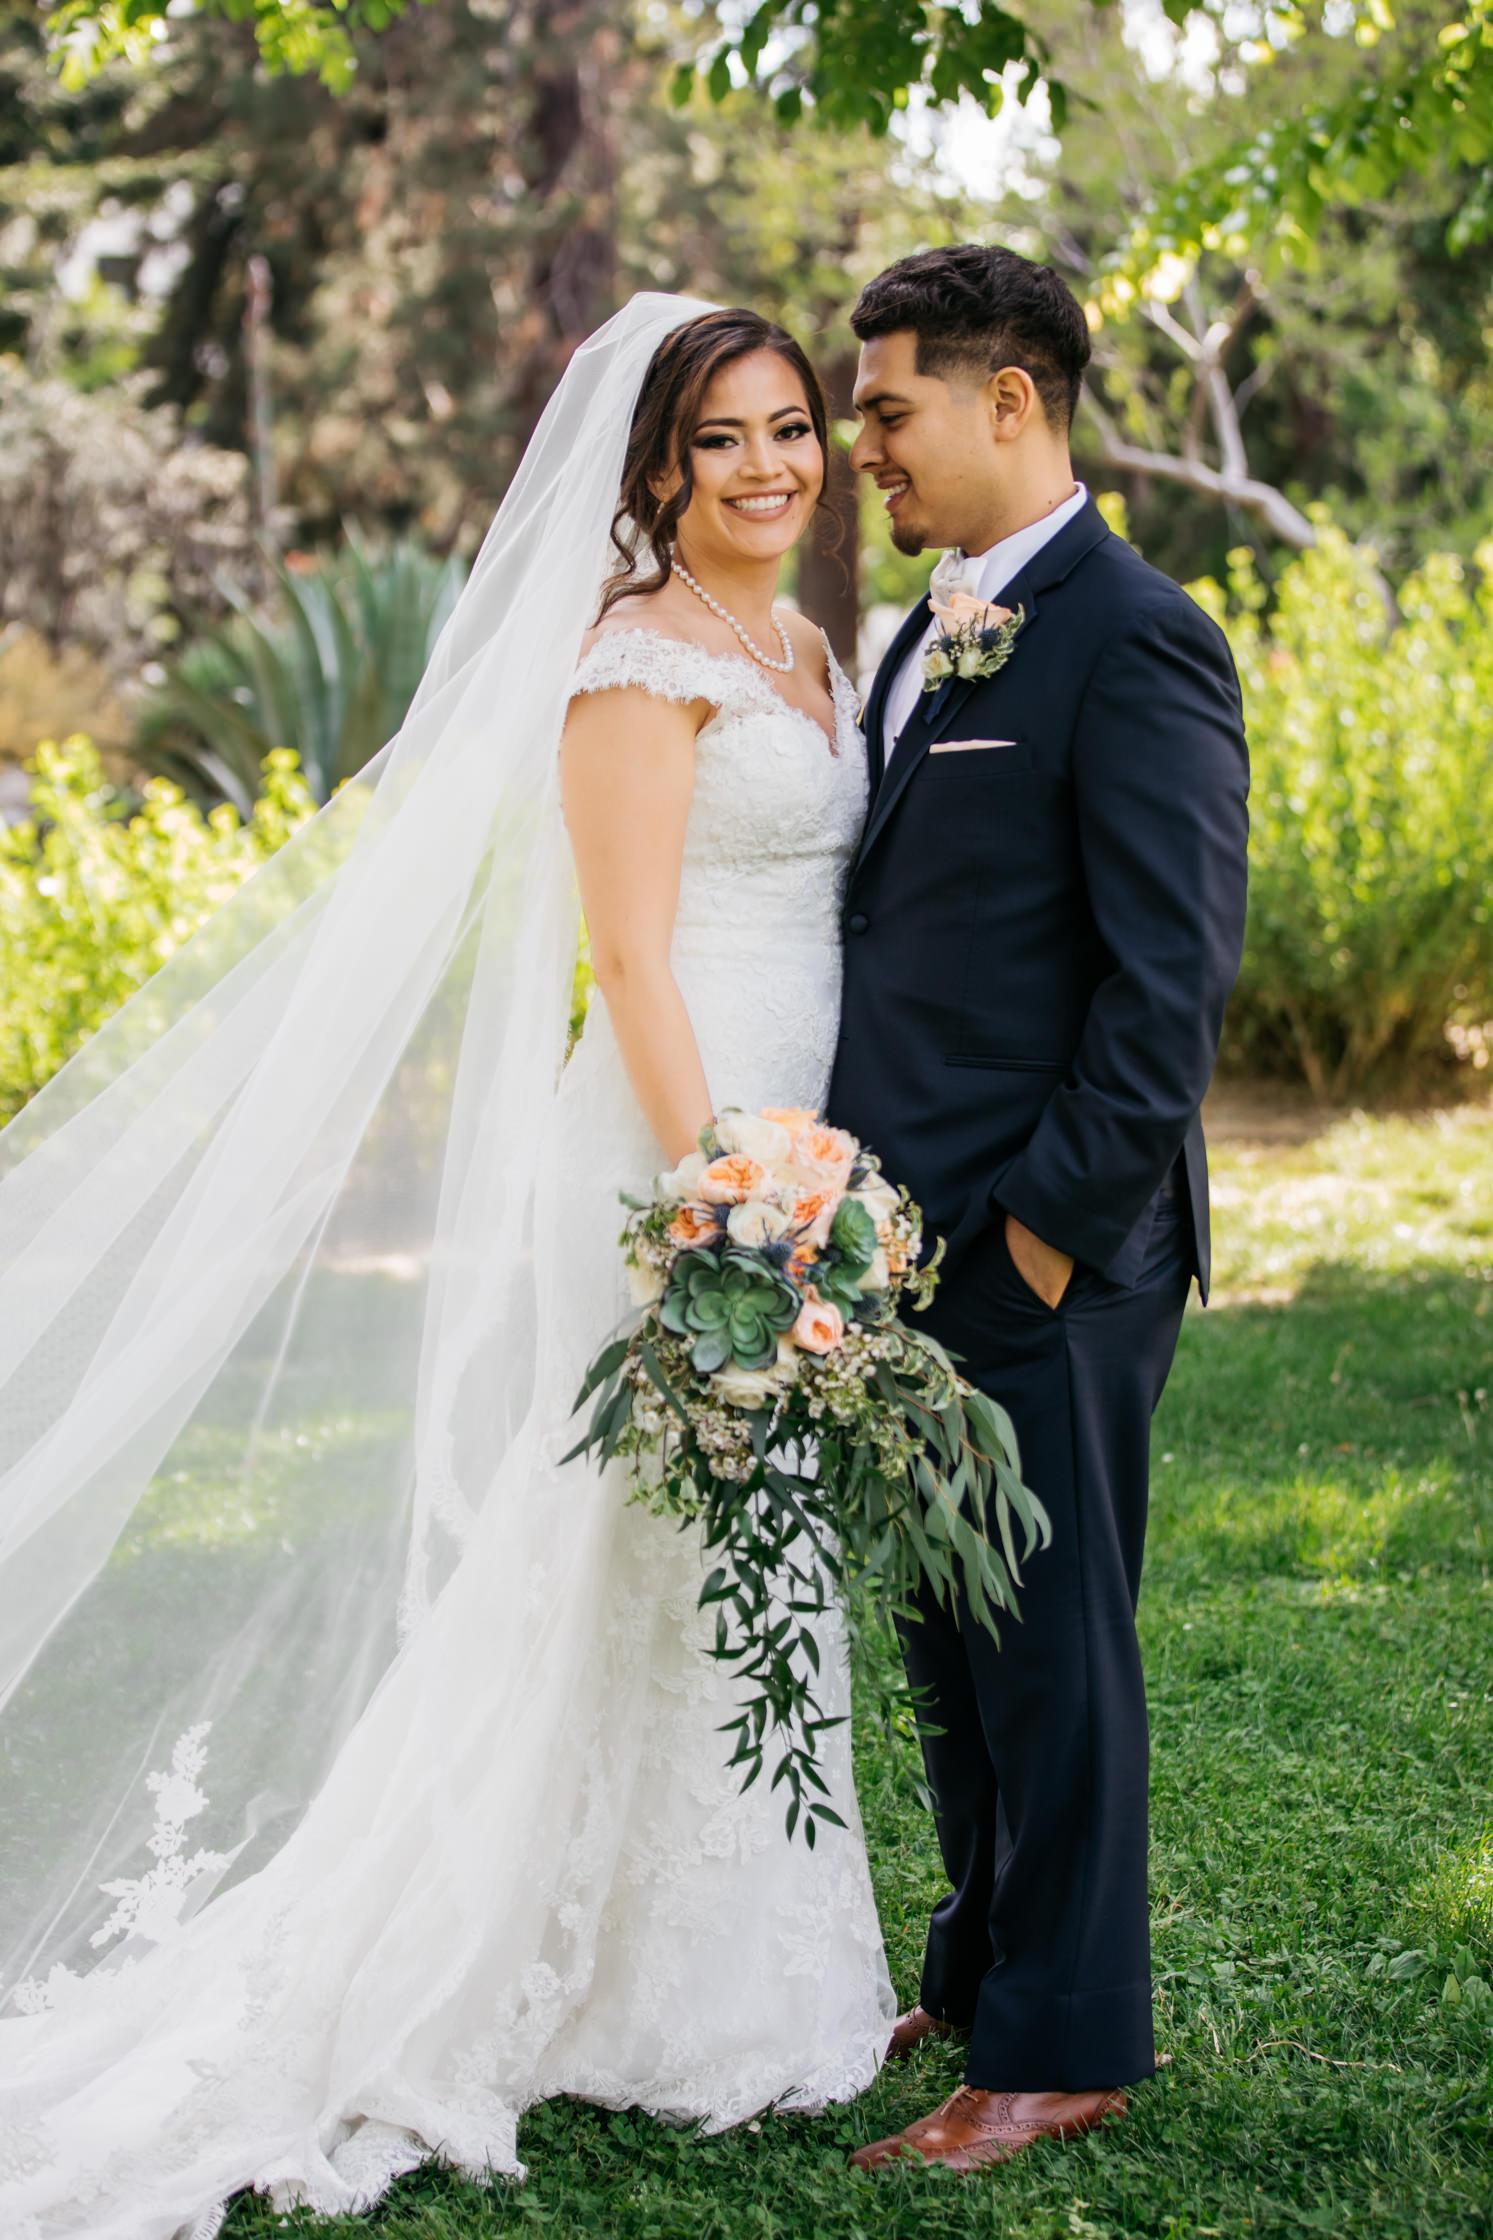 luis_joanna_wedding-49.jpg